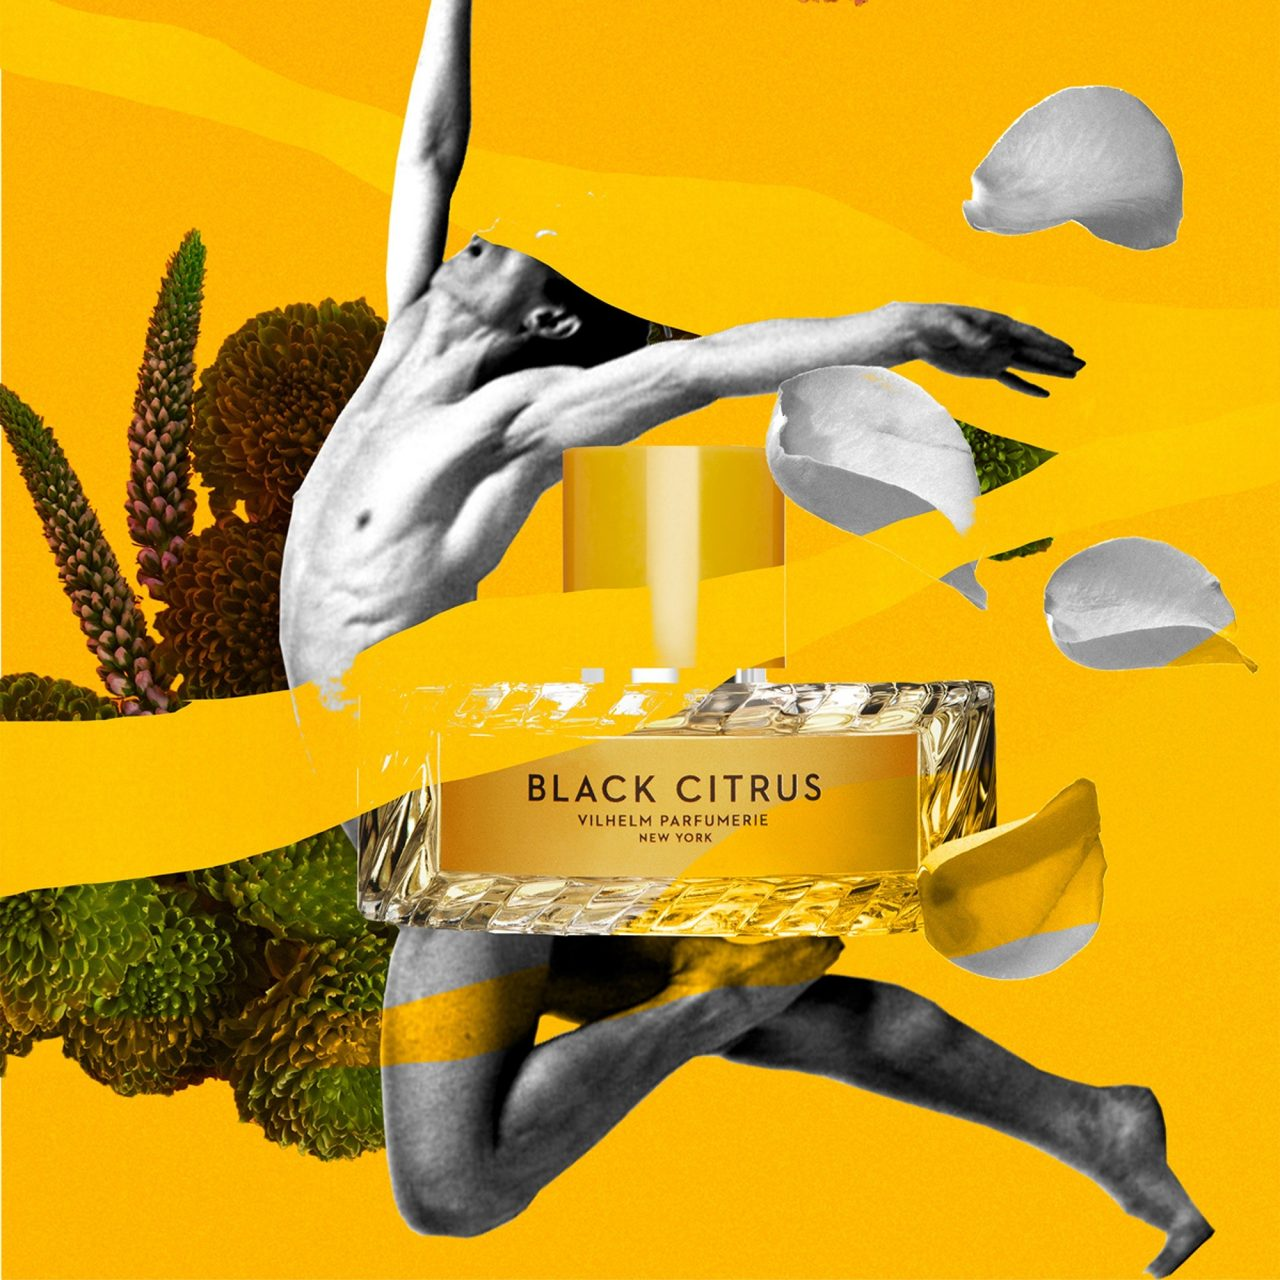 1612357048_black-citrus-visual-1280x1280.jpg